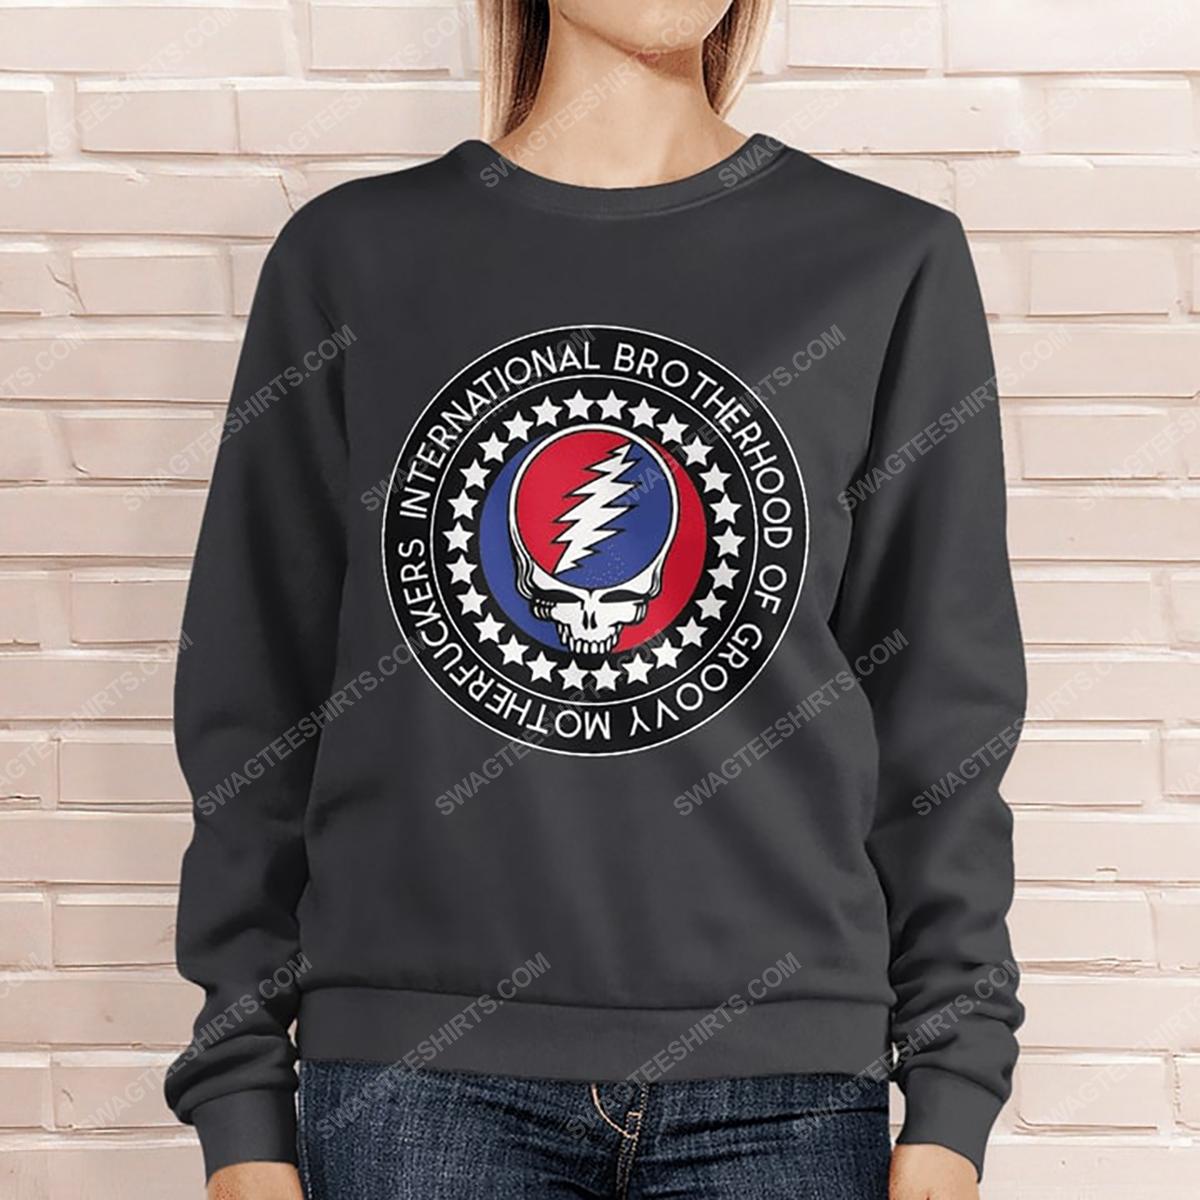 International brotherhood of groovy motherfuckers grateful dead sweatshirt 1(1)